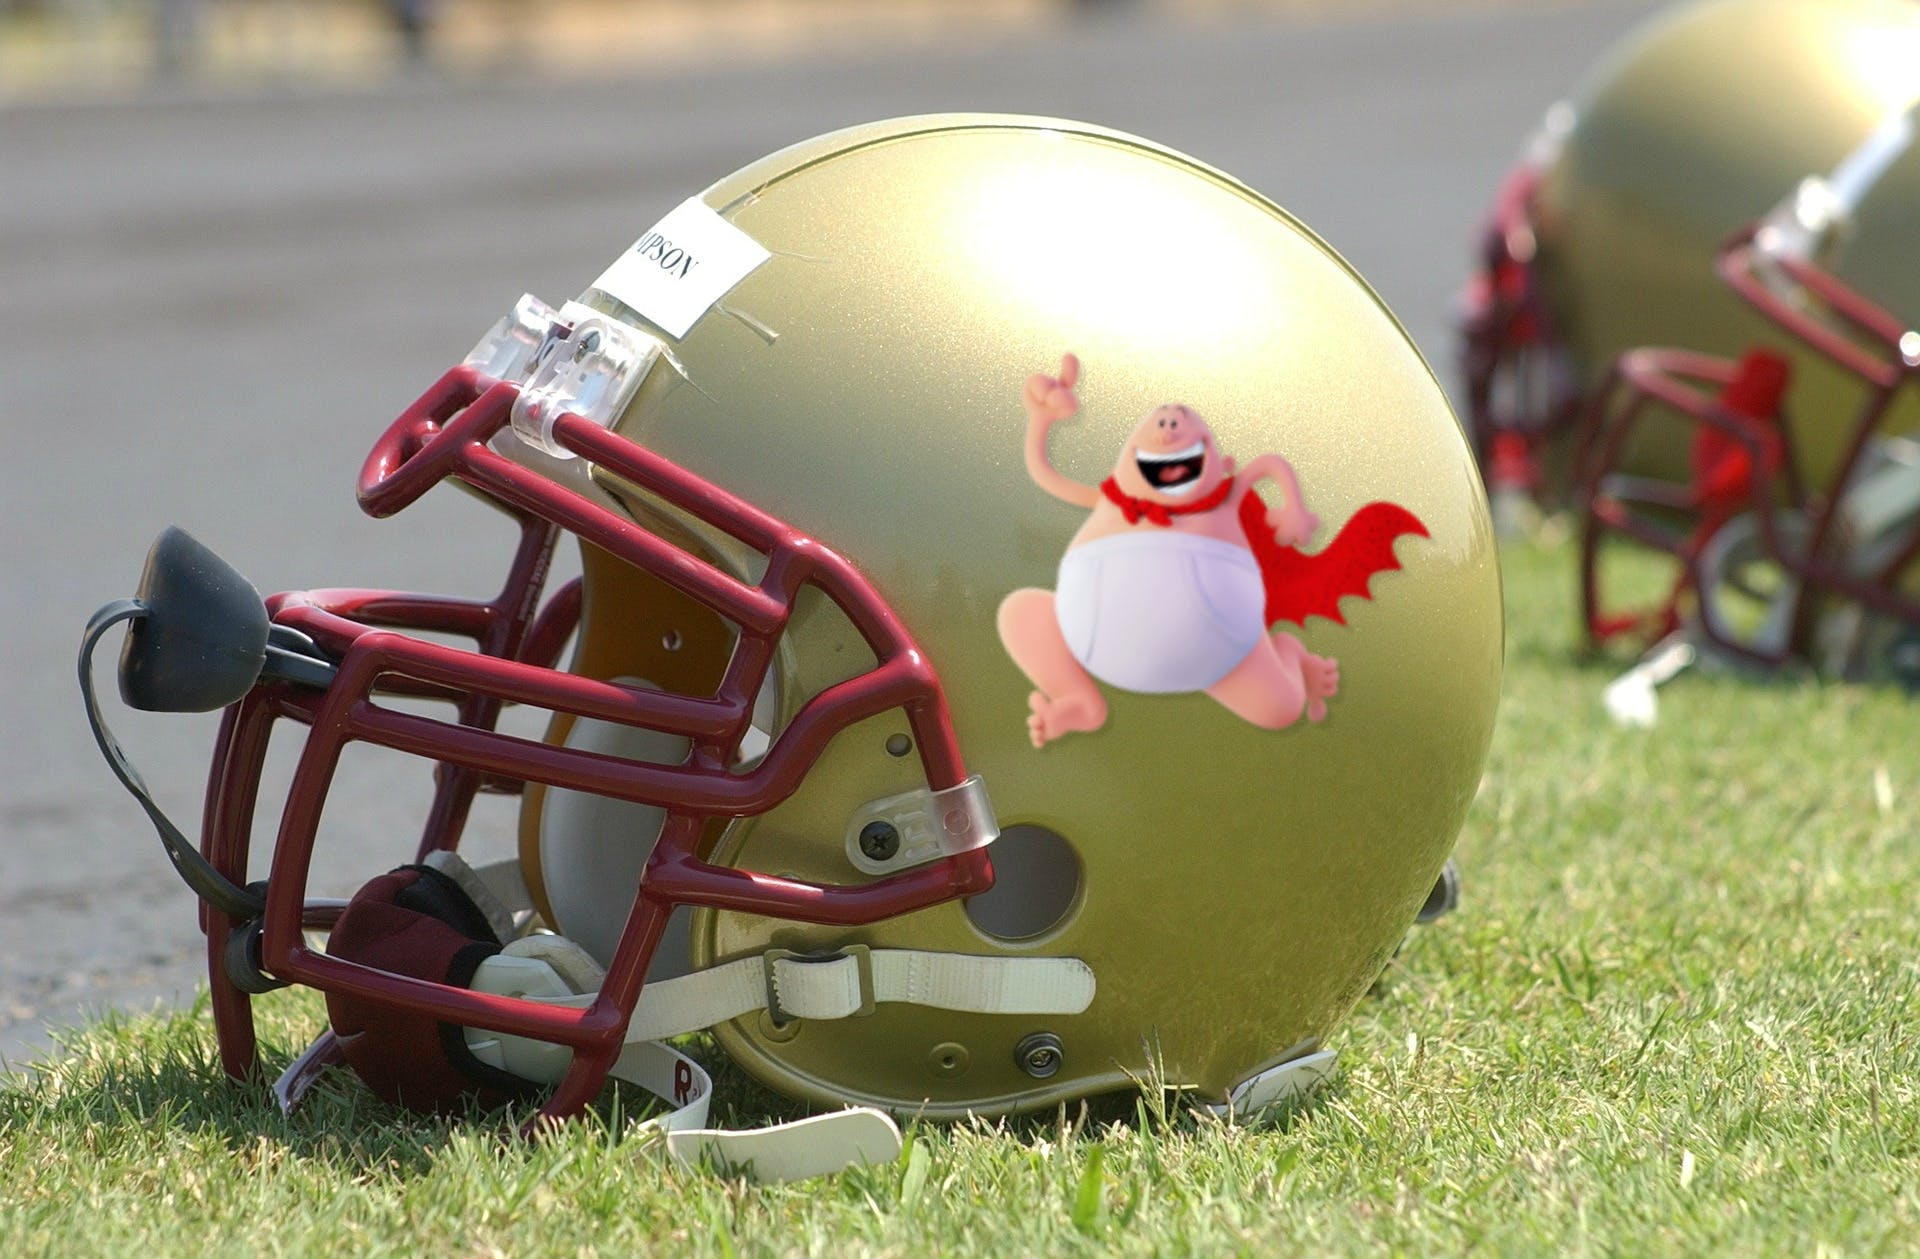 An American football helmet